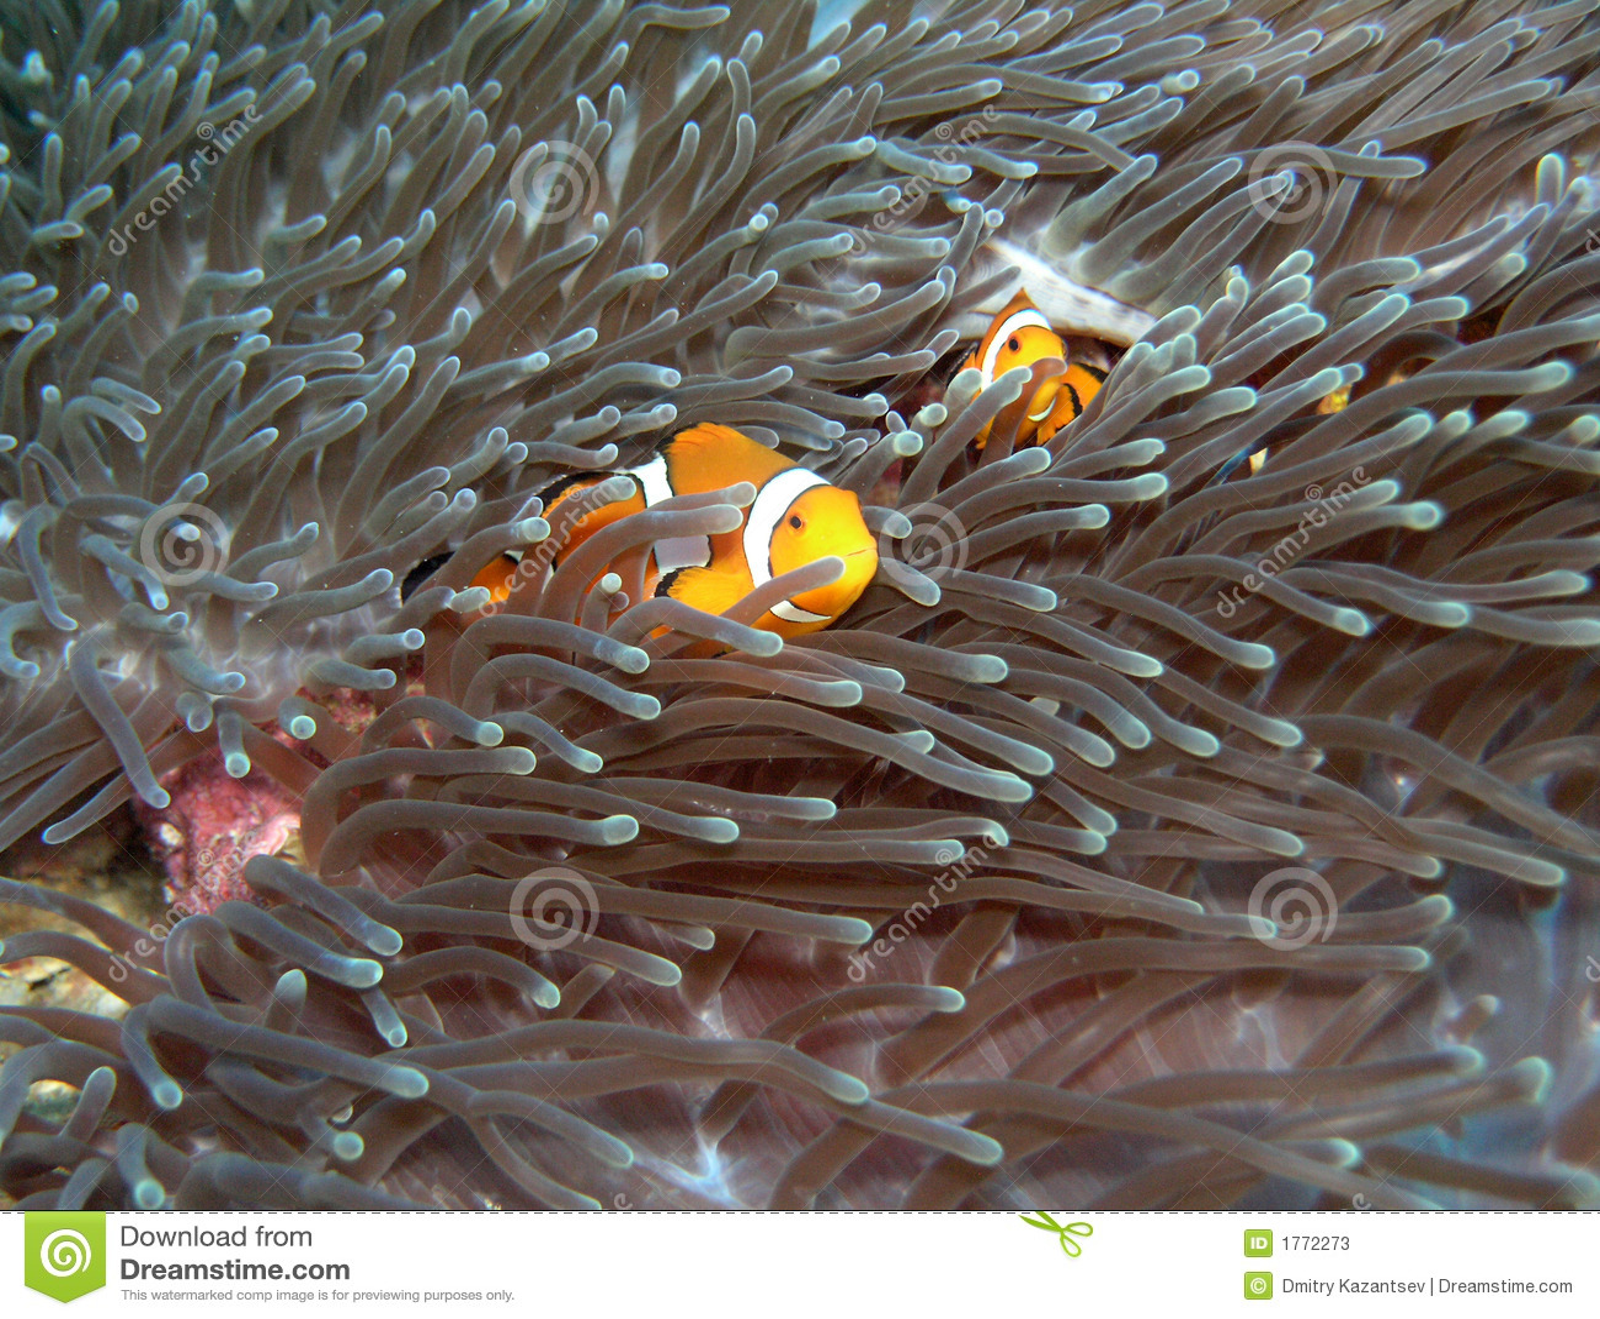 Nemo fish2